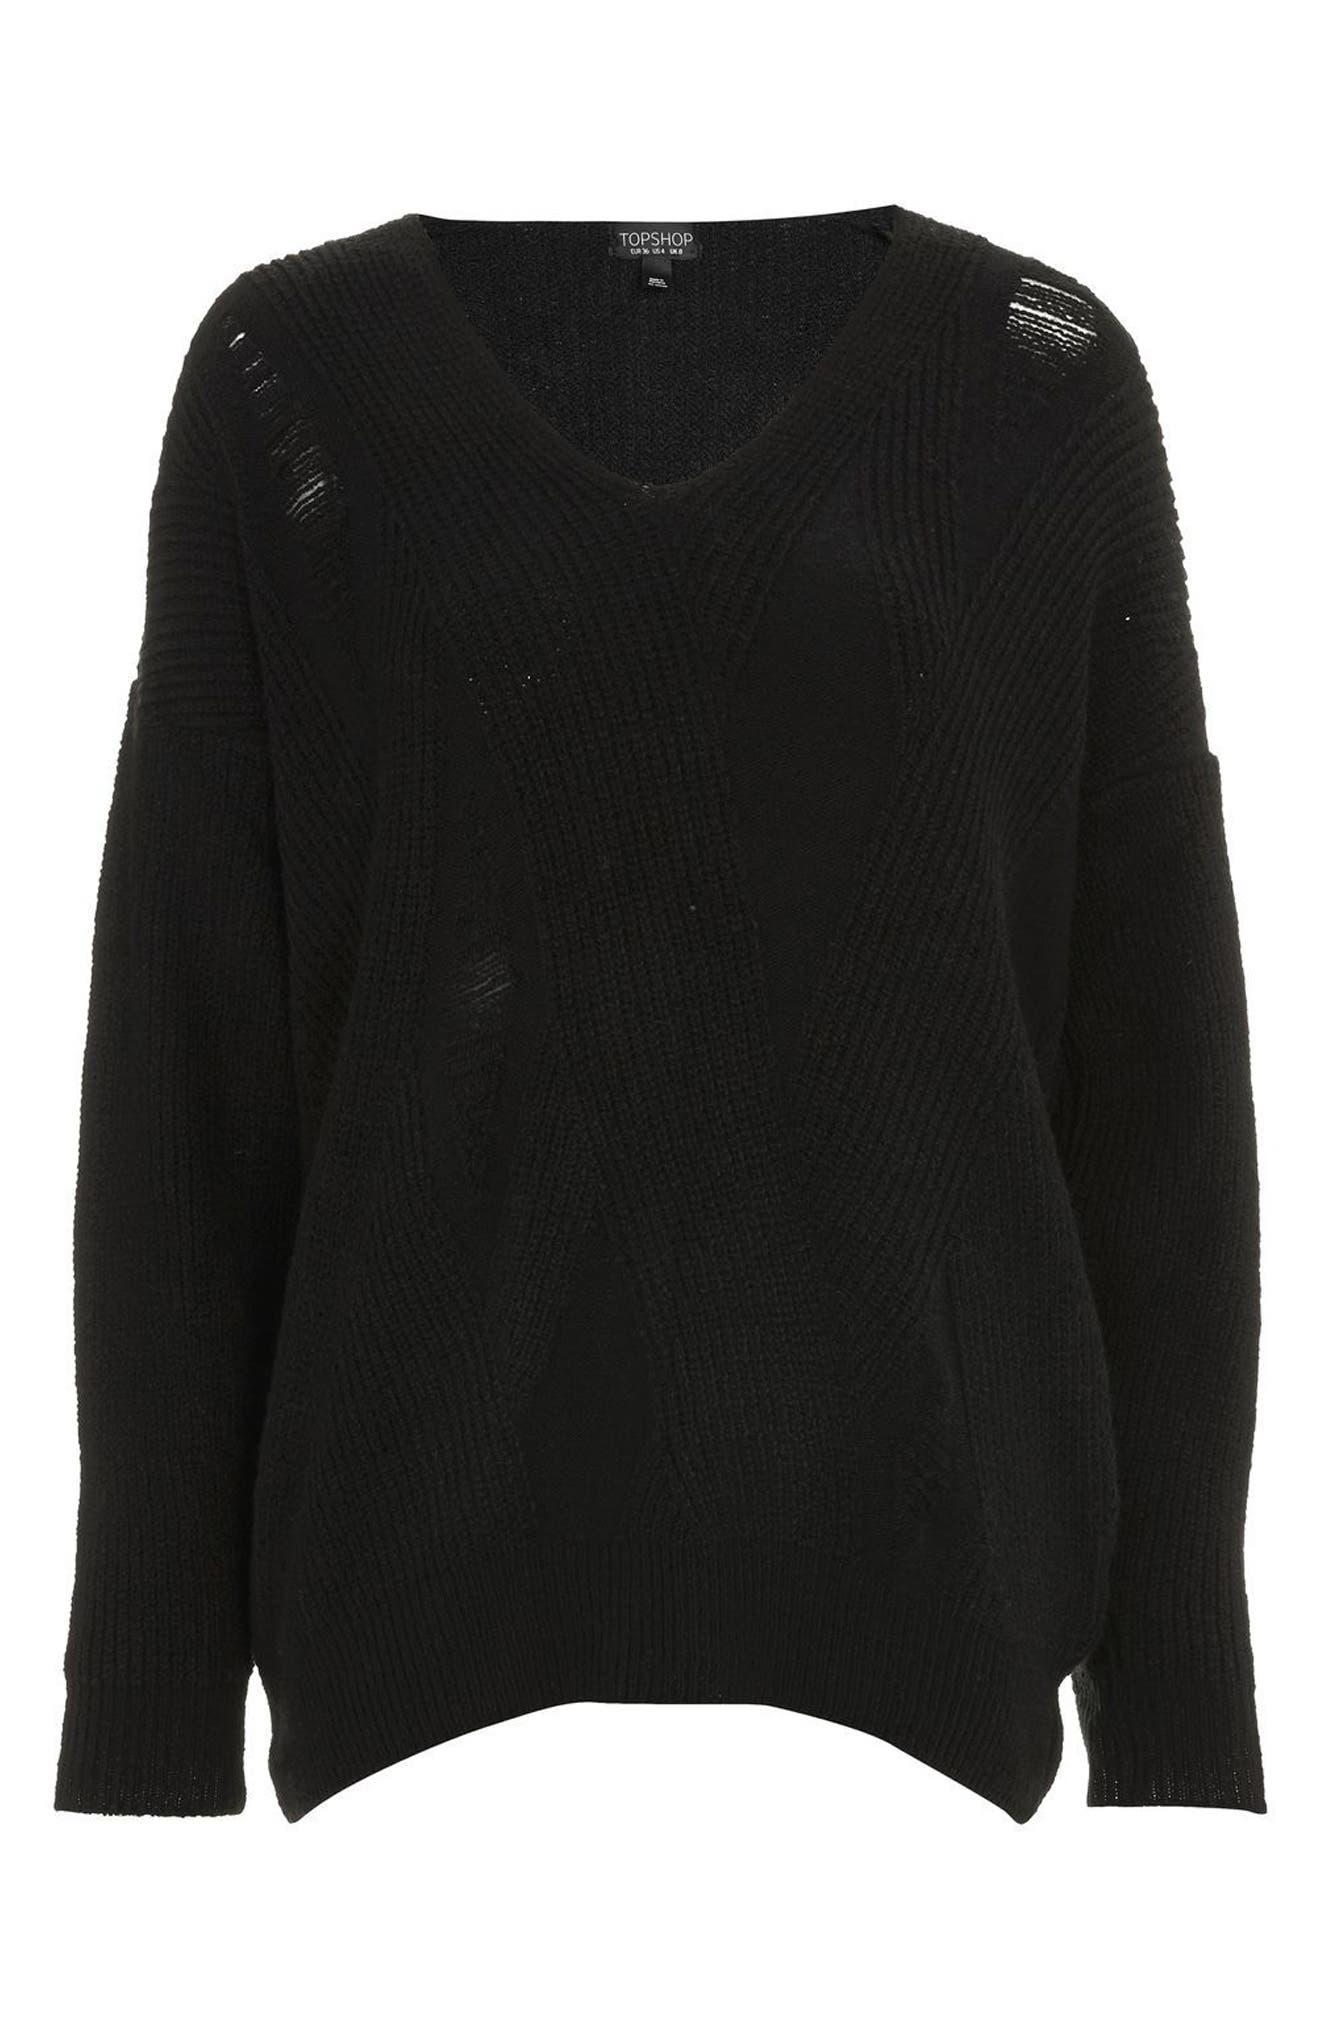 Ladder Stitch Sweater,                             Alternate thumbnail 4, color,                             Black